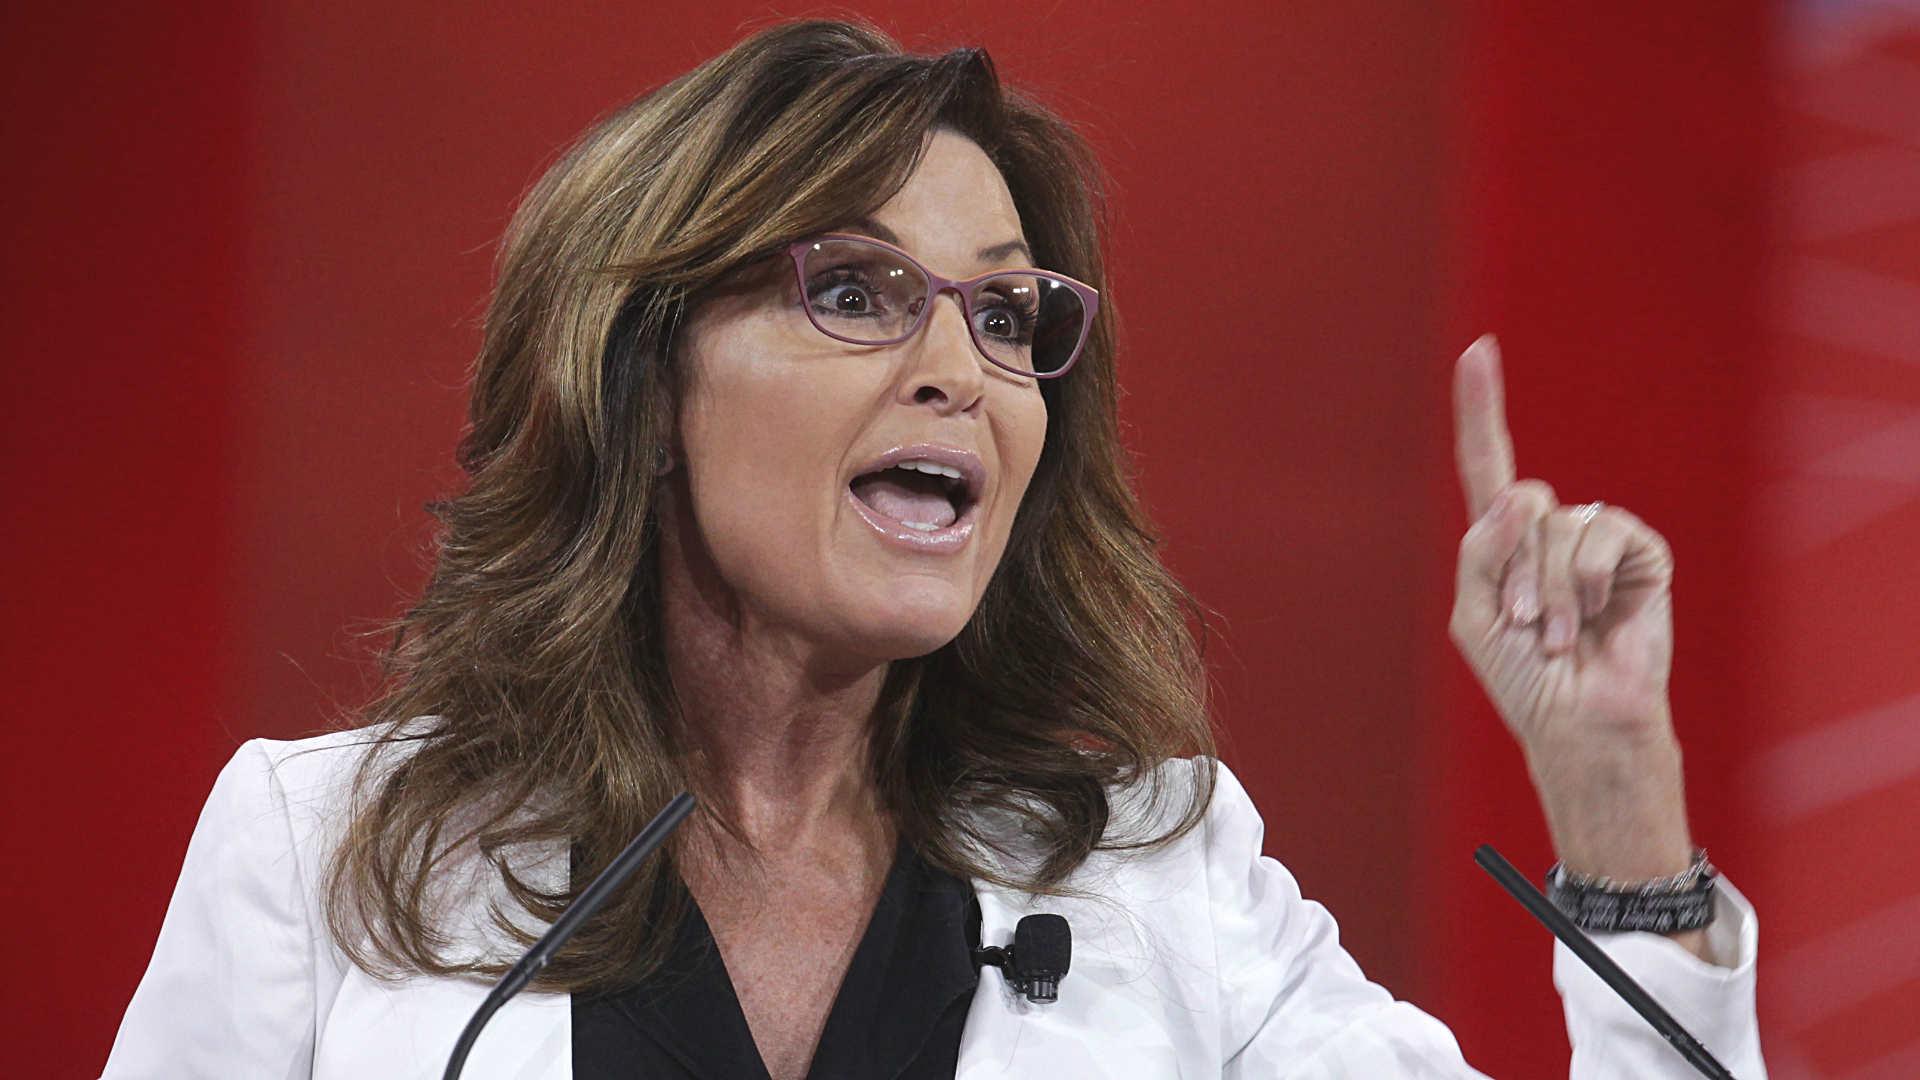 Sarah-Palin-082815-USNews-Getty-FTR